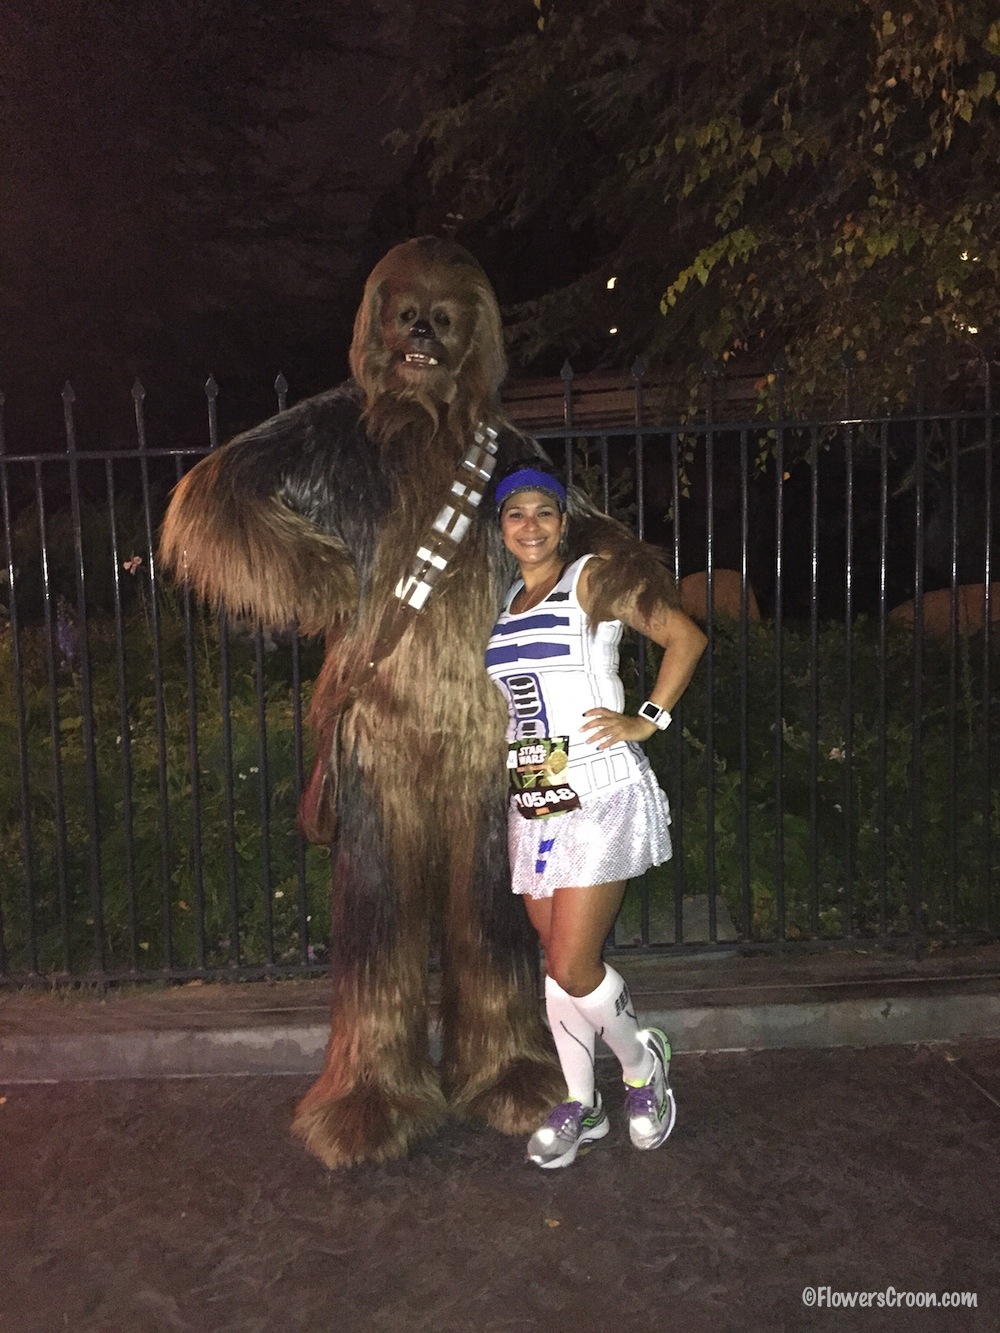 chewbacca-star-wars-half-disneyland.jpg